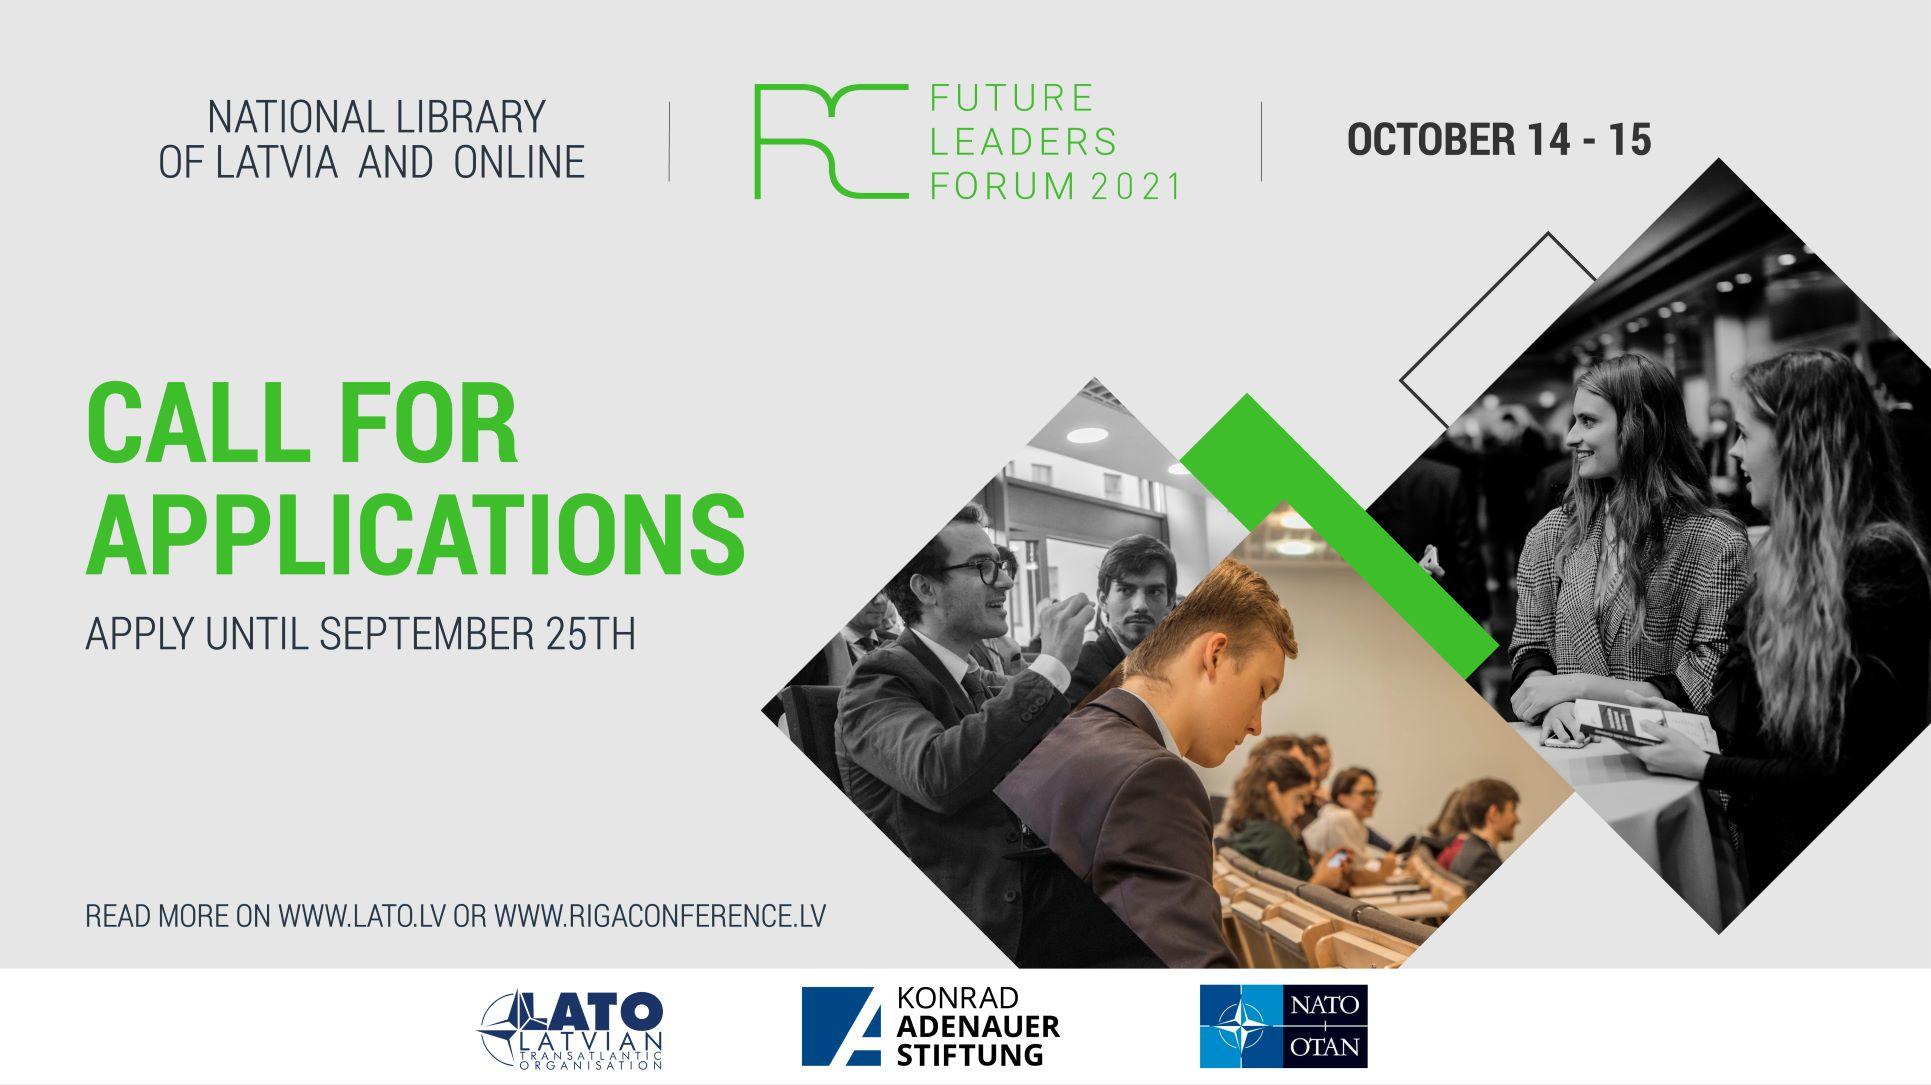 Future Leaders Forum 2021